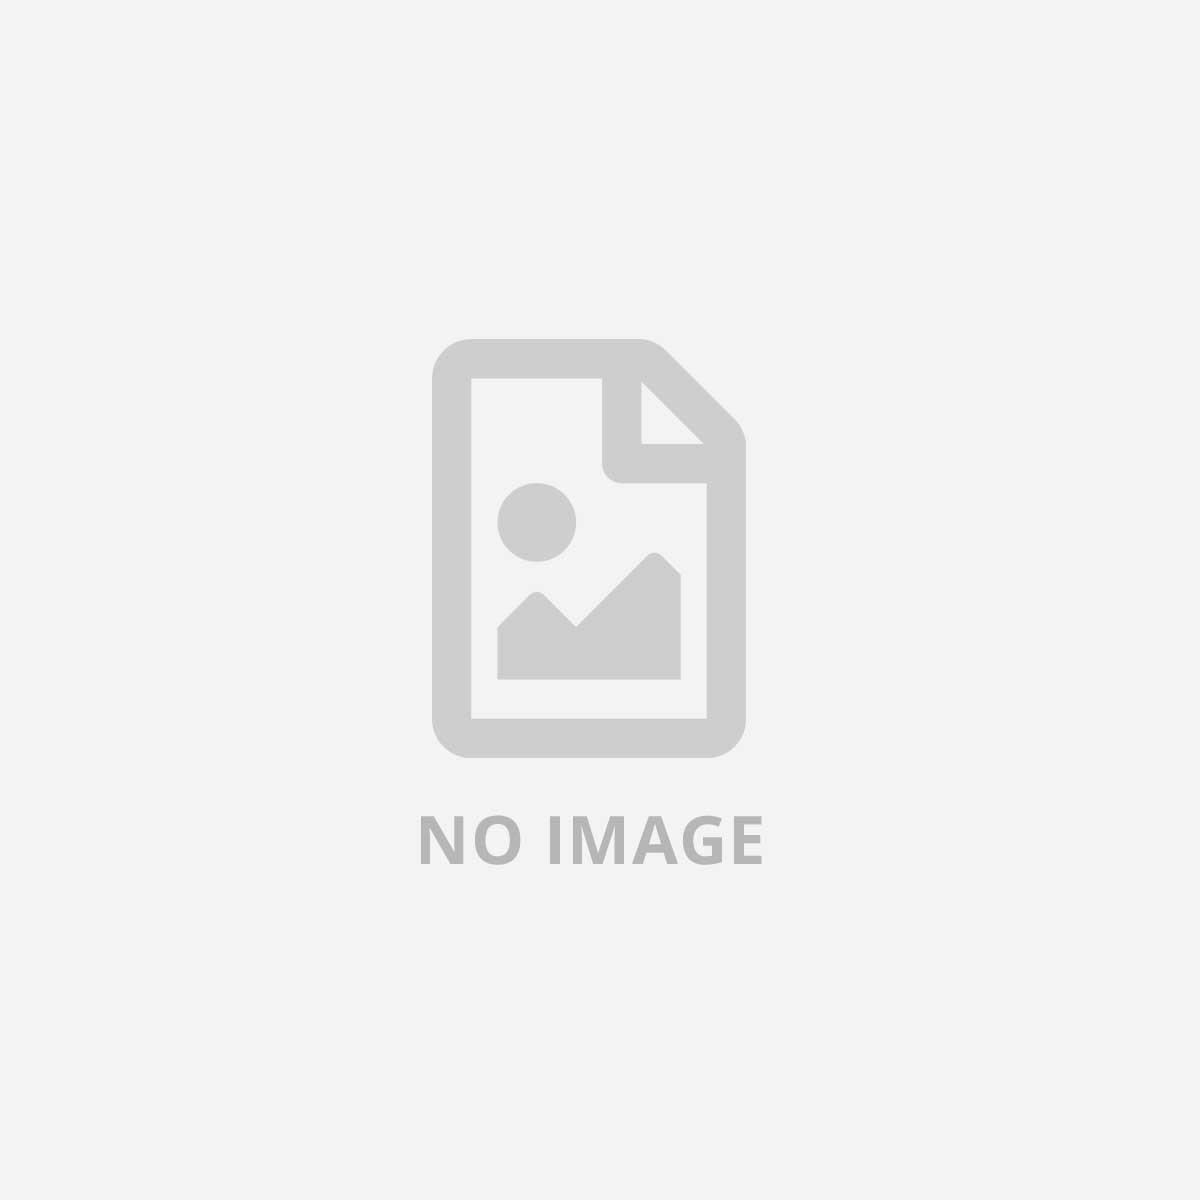 TESABASIC 15X33M IN FLAWPACK